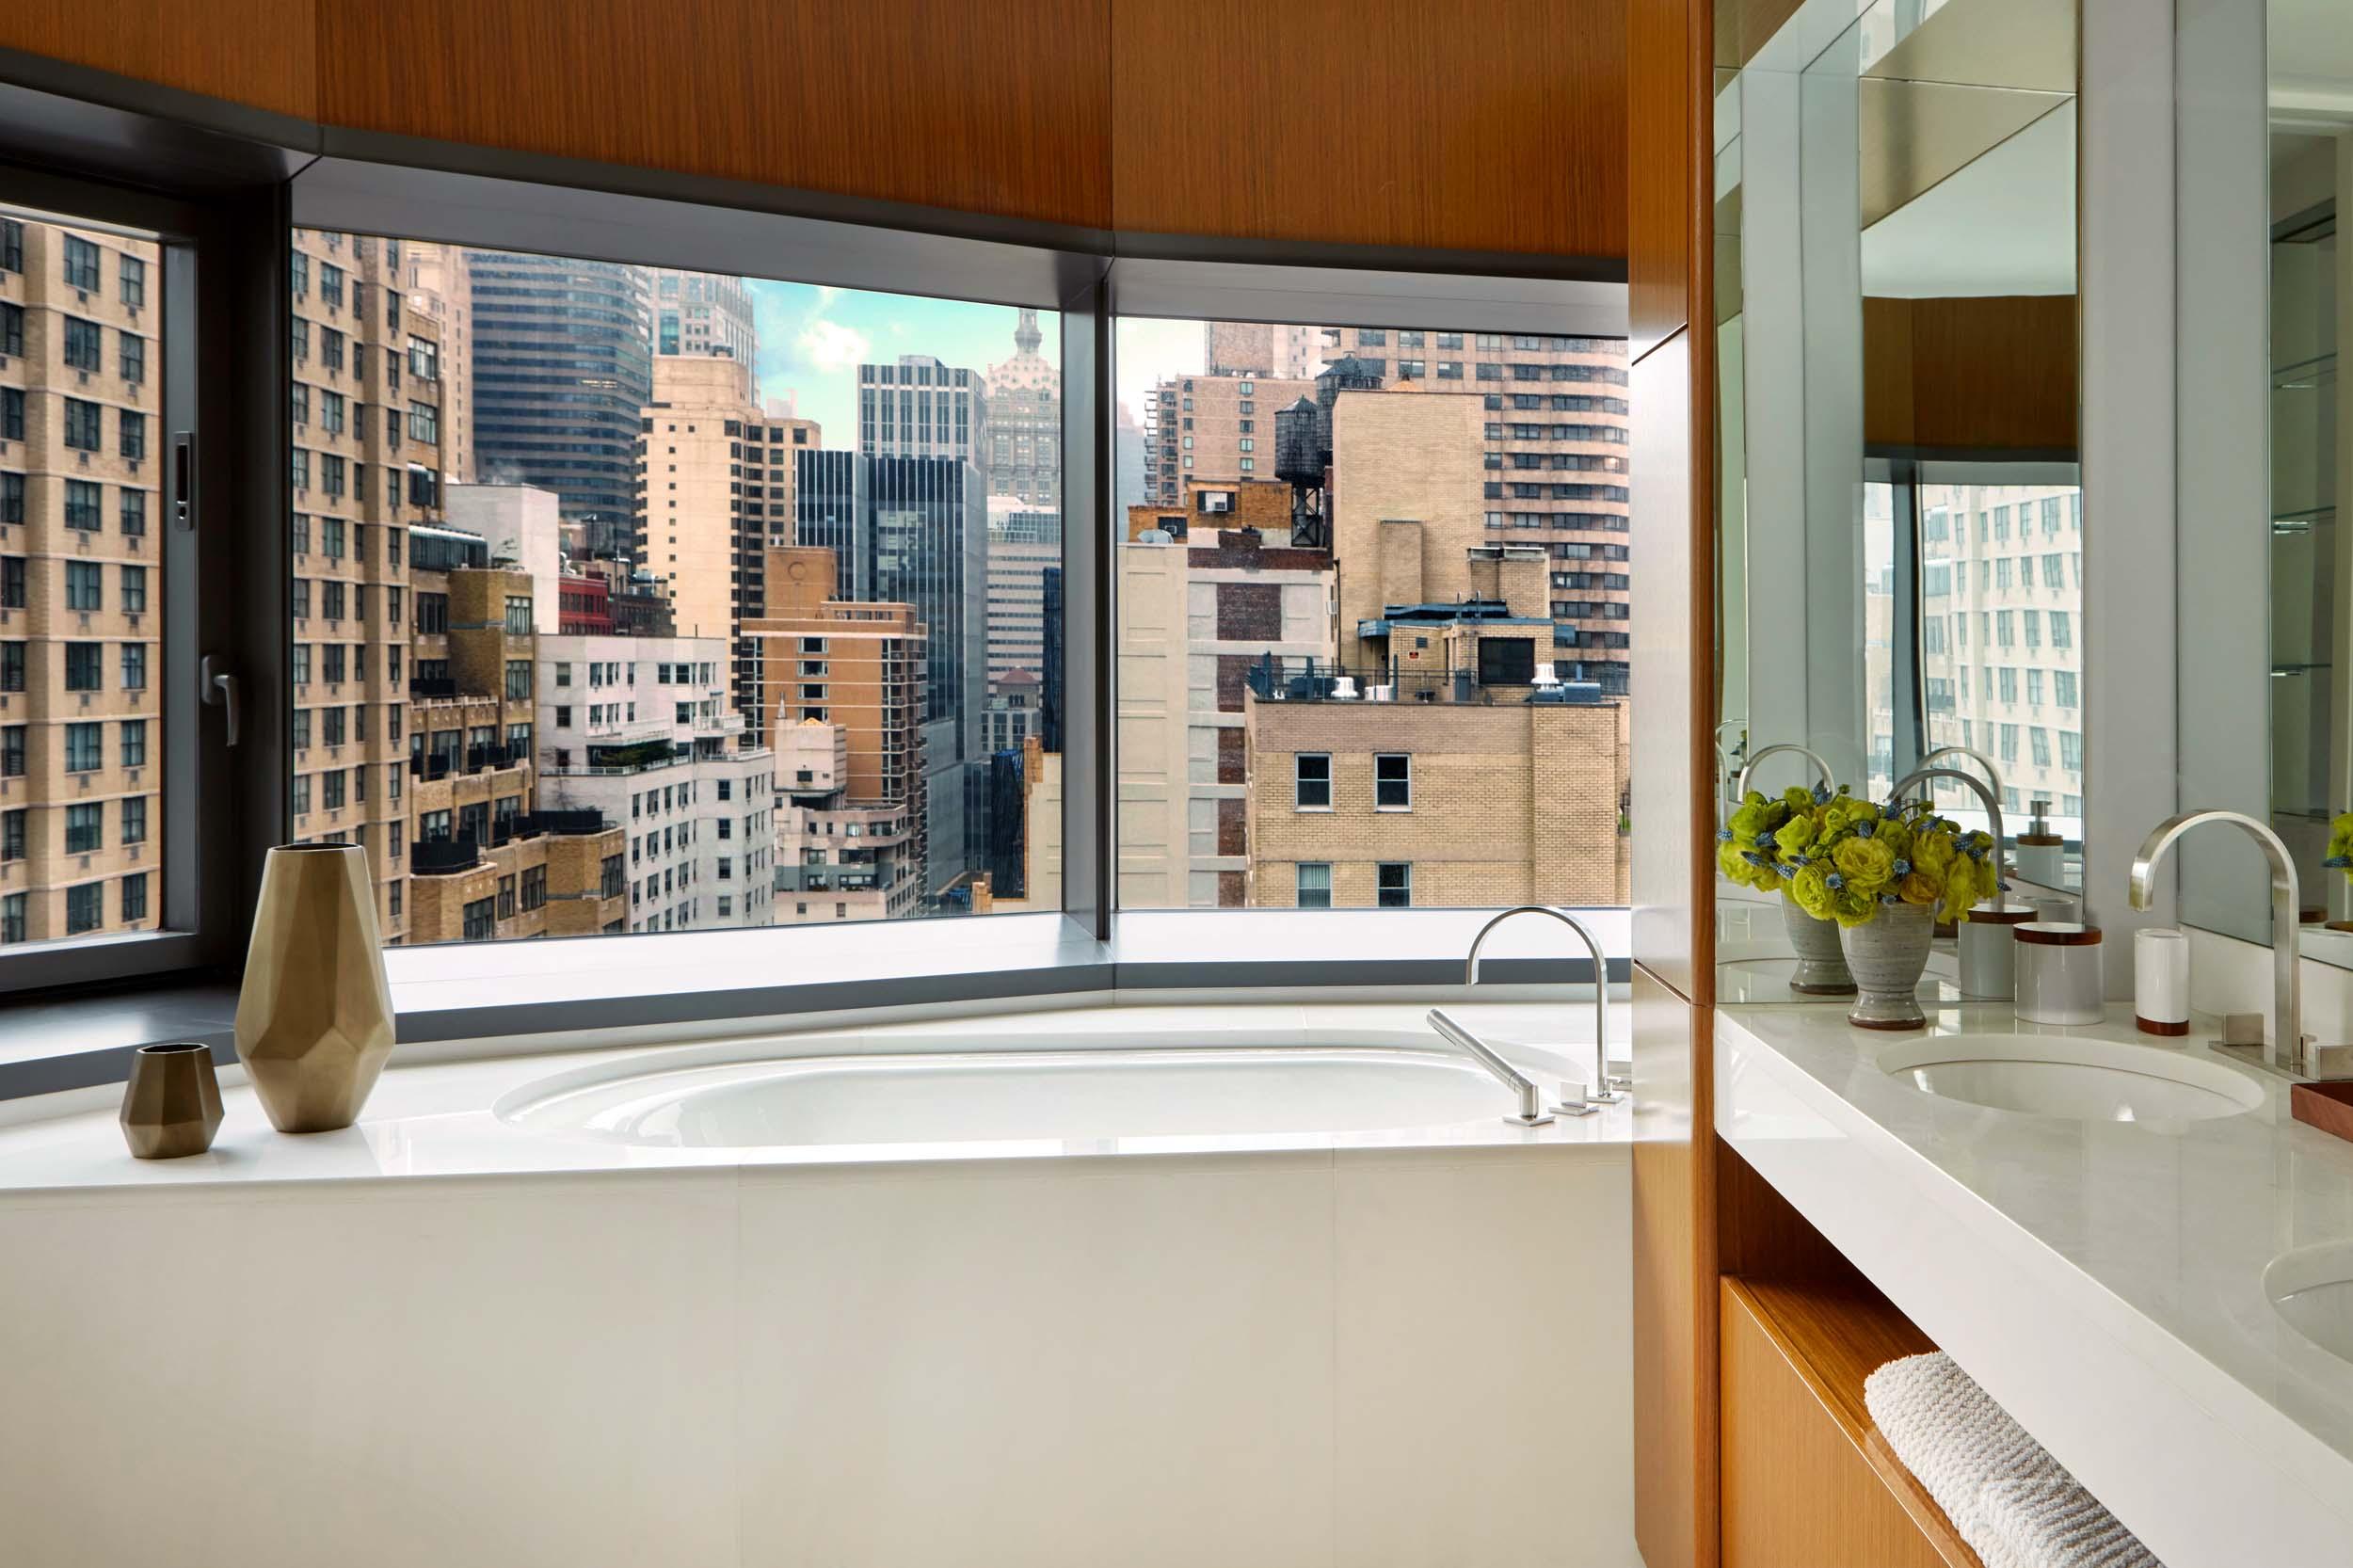 Jarret+Yoshida-Bathroom With View NYC 50UNP